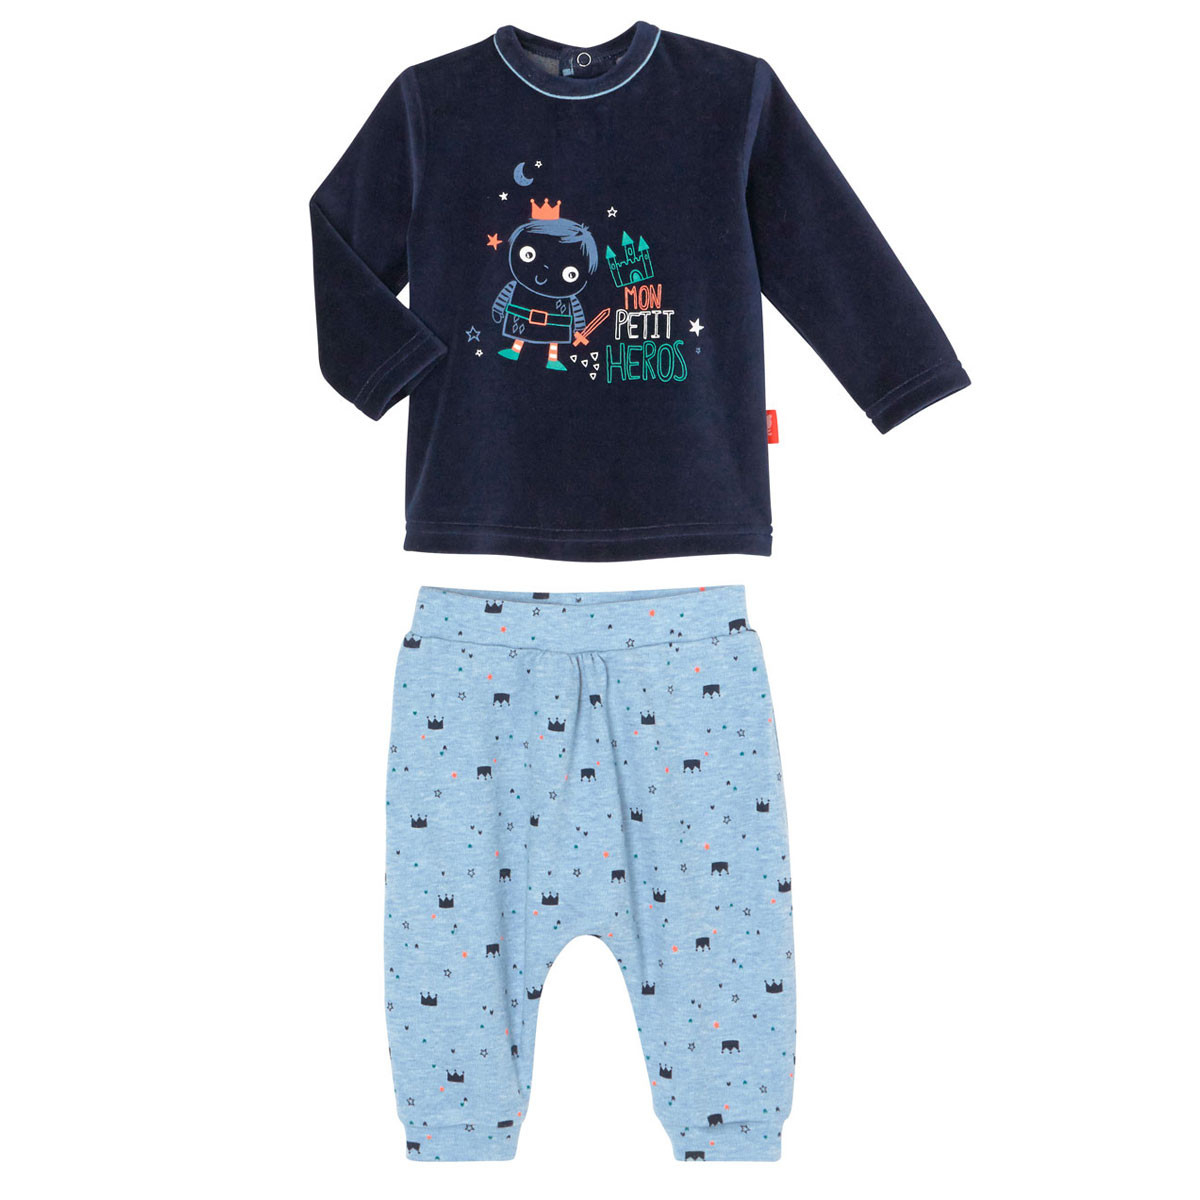 Ensemble bleu marine bébé garçon haut + sarouel hiver Petit Héros